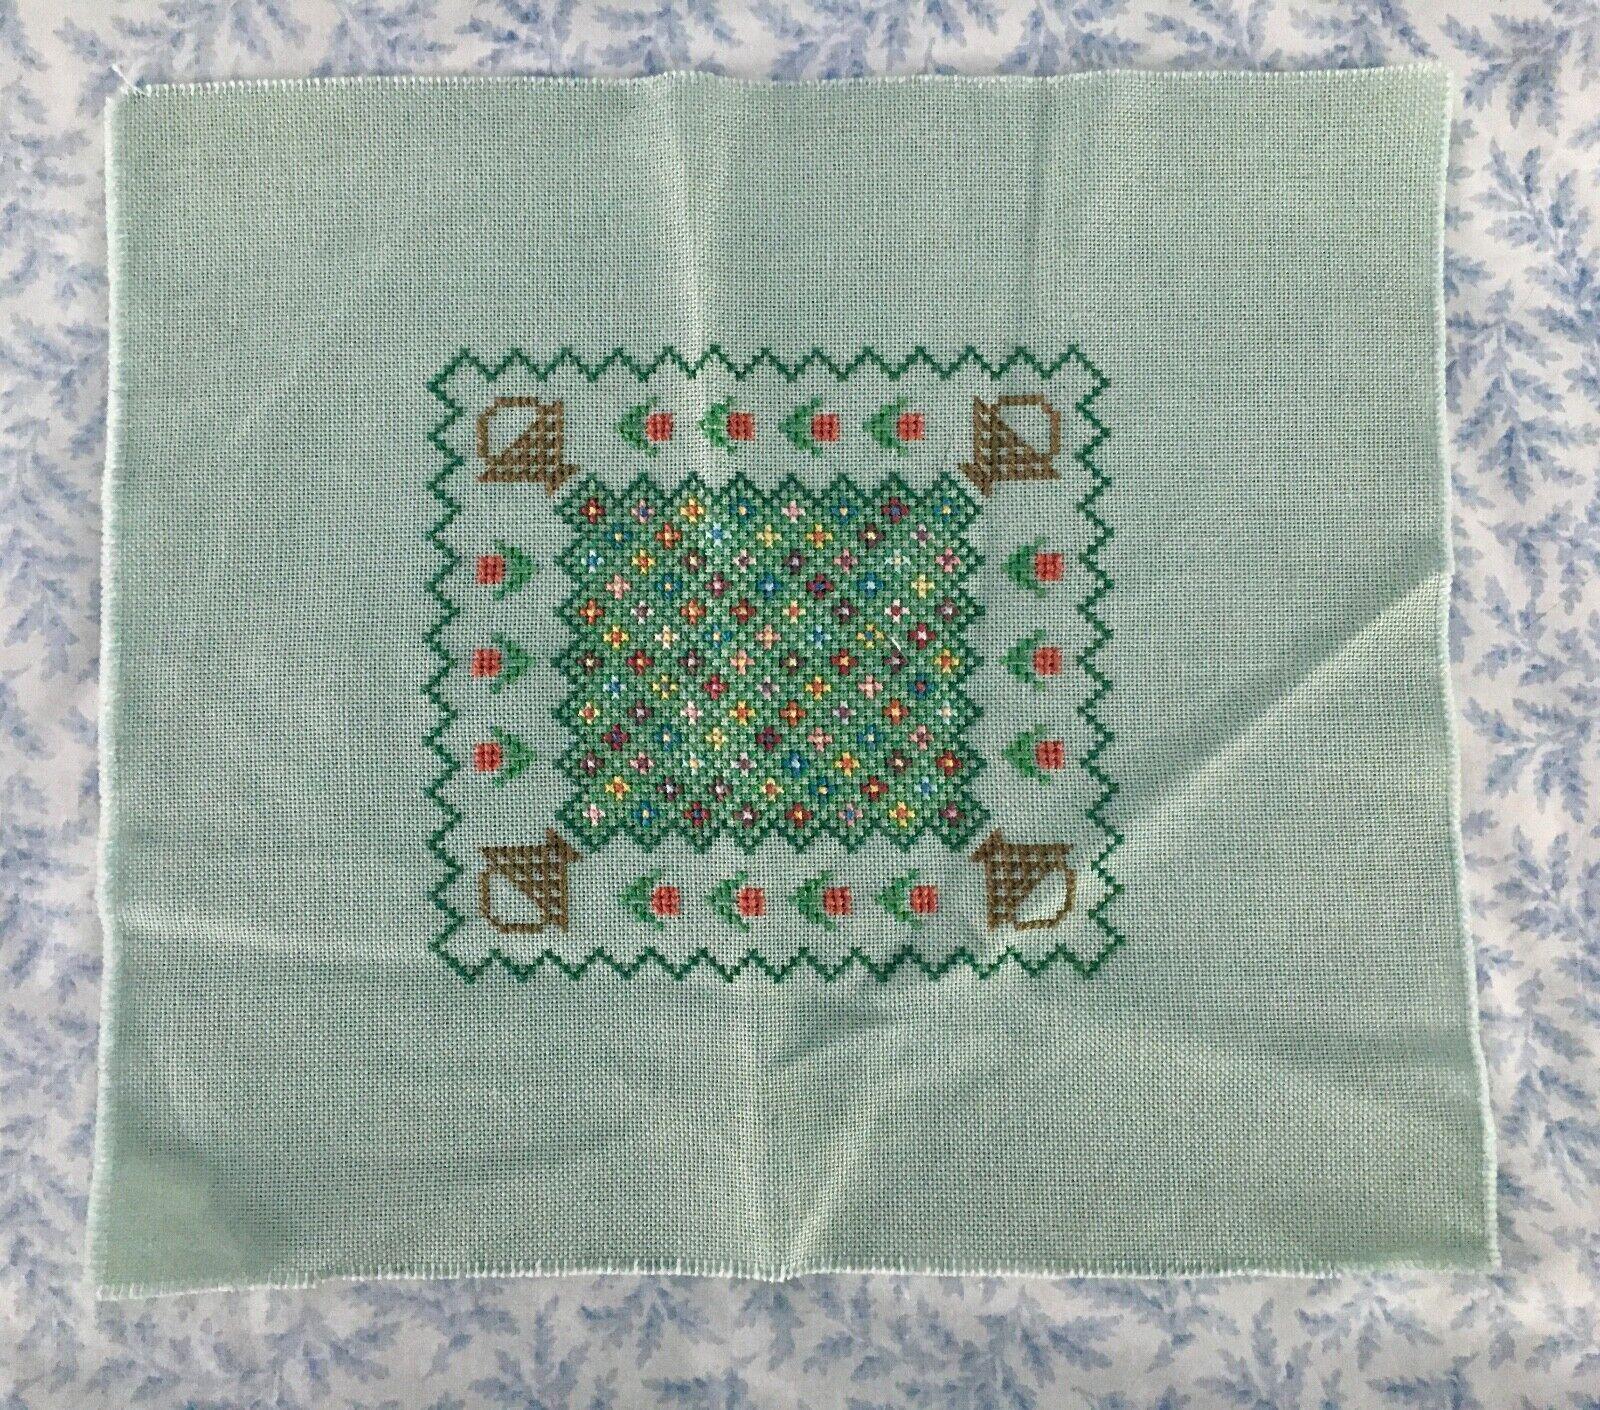 Completed Cross Stitch Basket Garden - $14.99